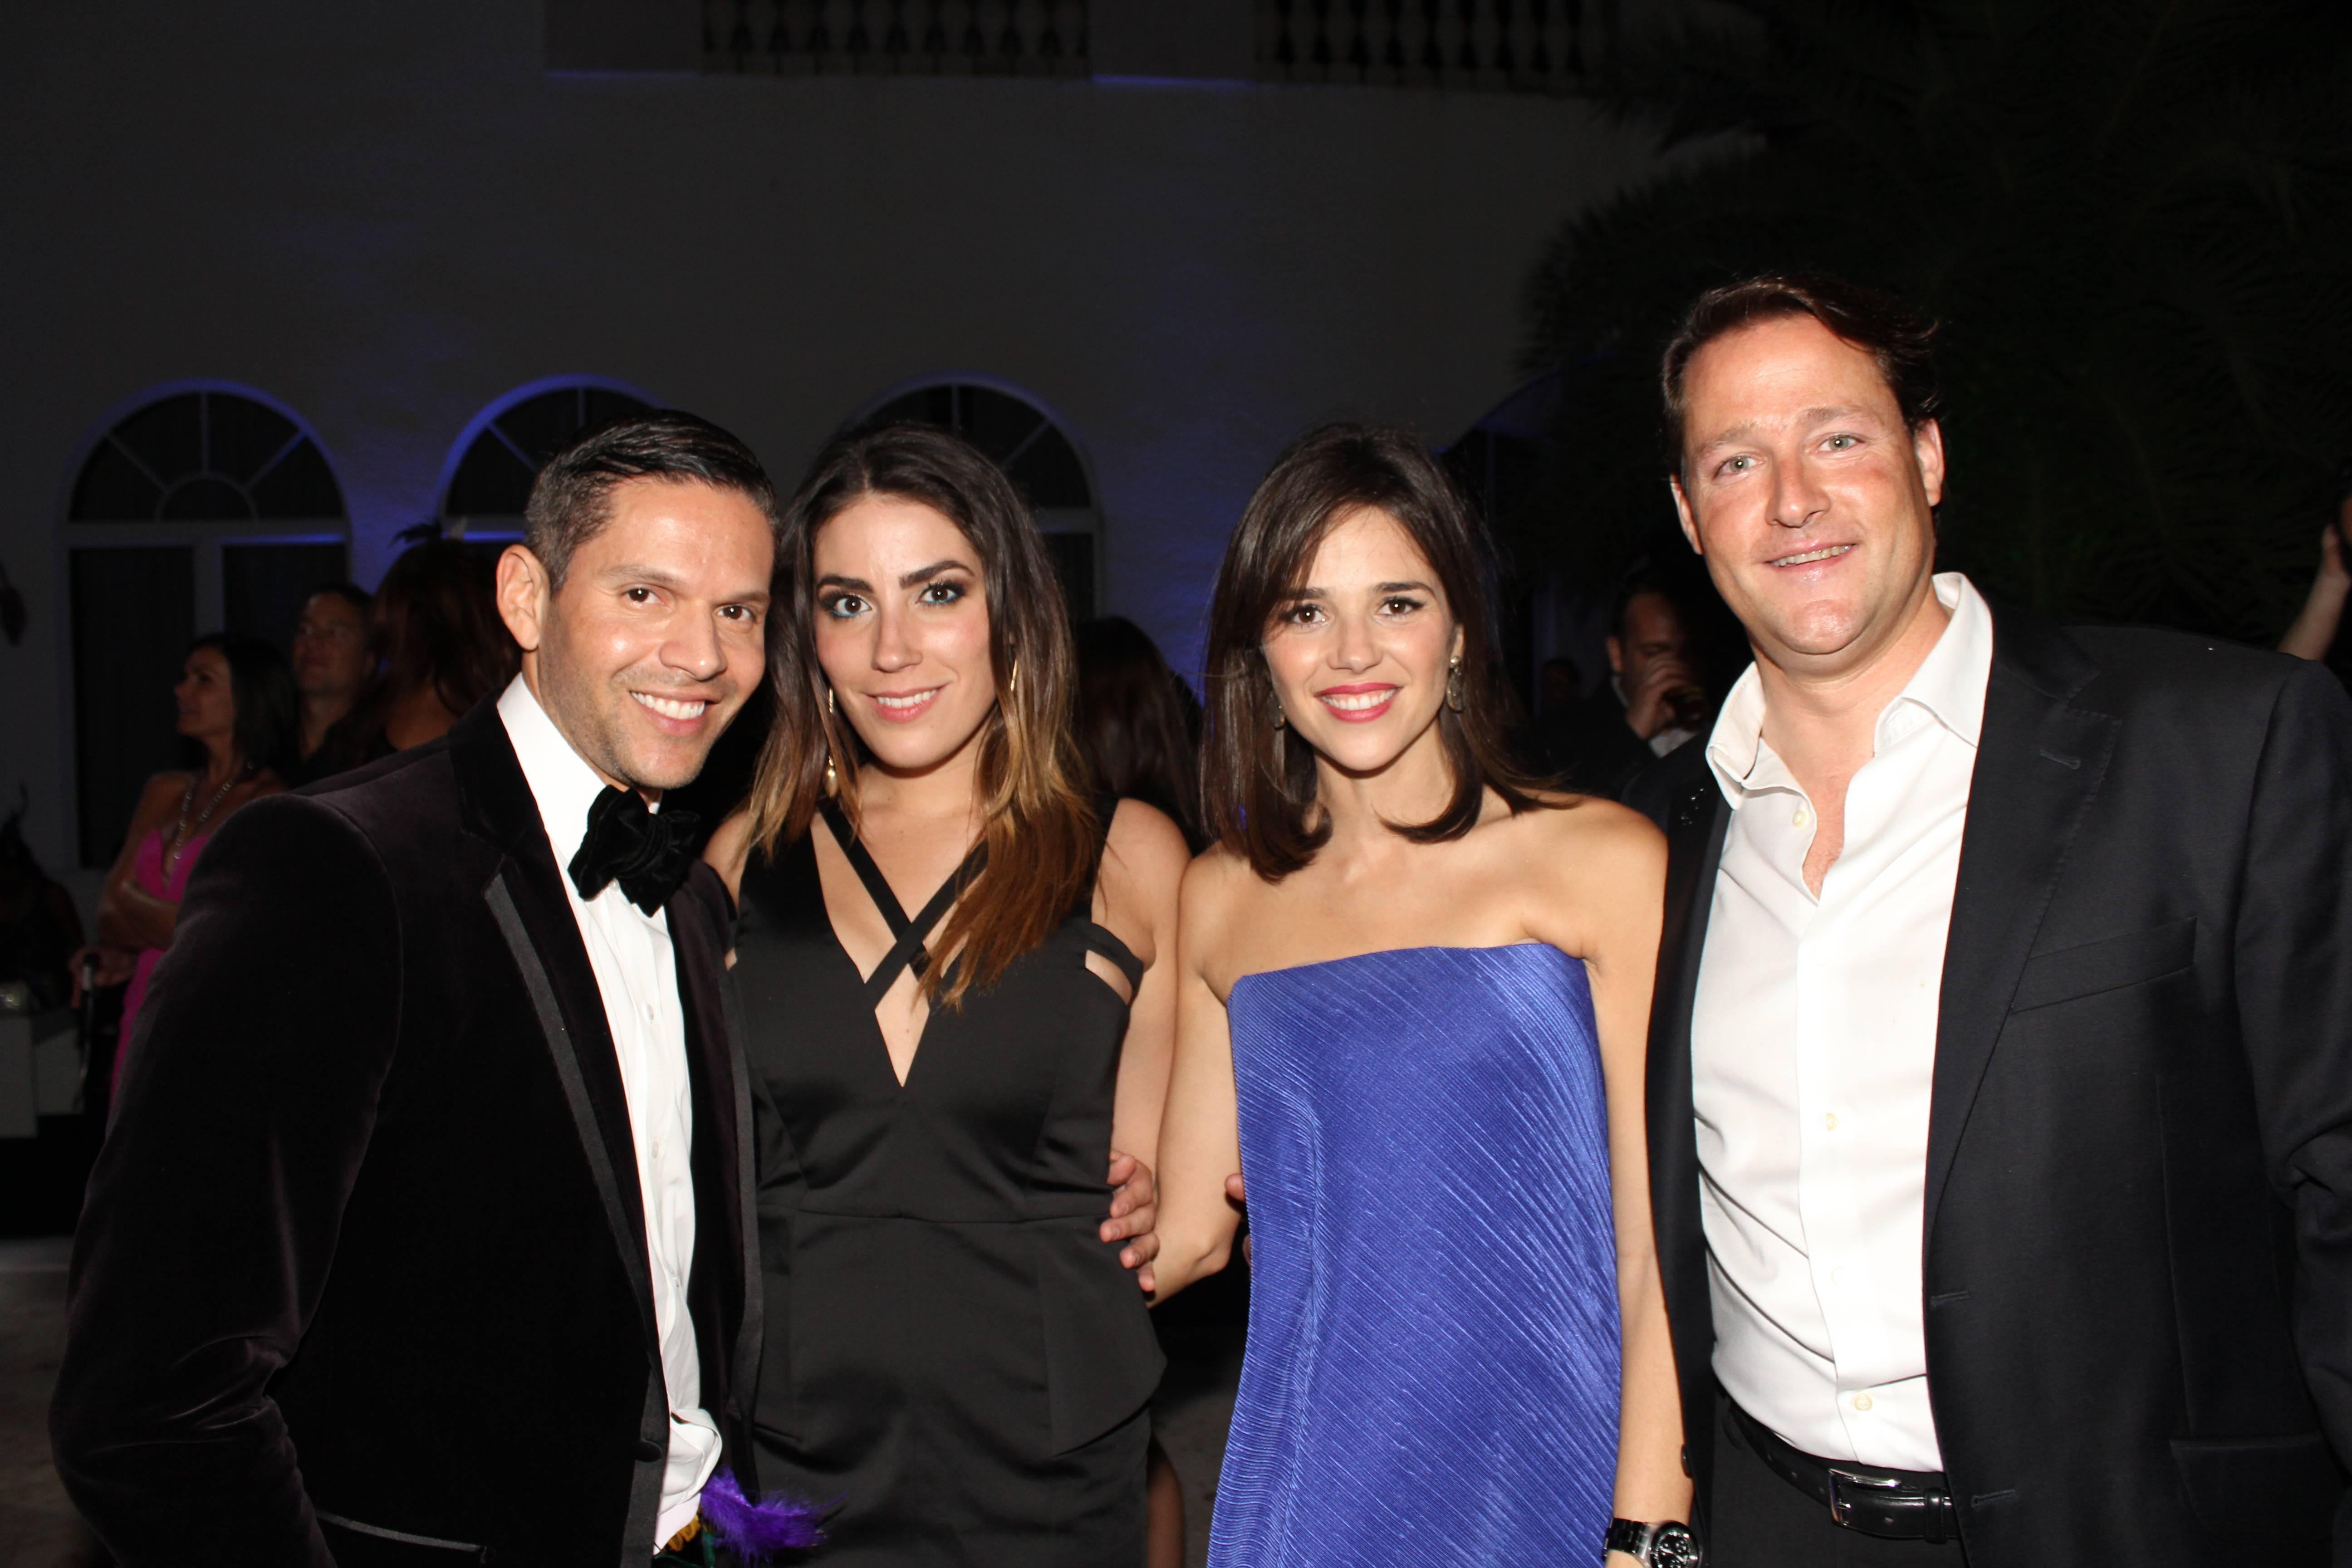 Rodner Figueroa, Luly Valls, Ana and Sean Wolfington